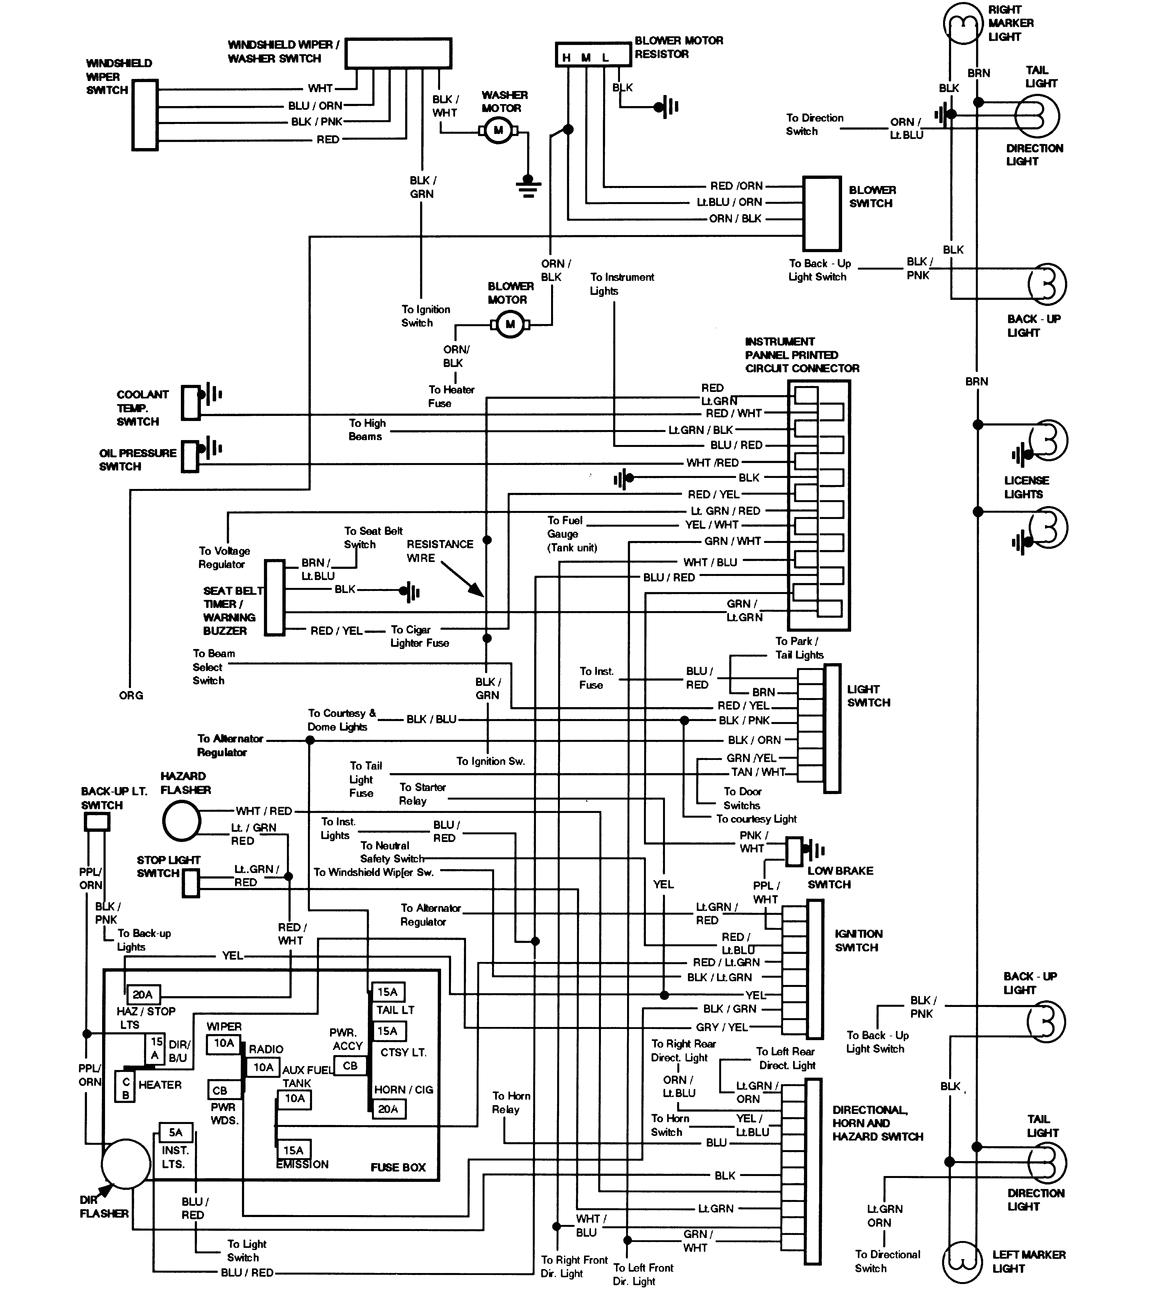 1982 f250 wiring diagram schema diagram database 1982 ford f250 wiring diagram 1982 ford bronco wiring